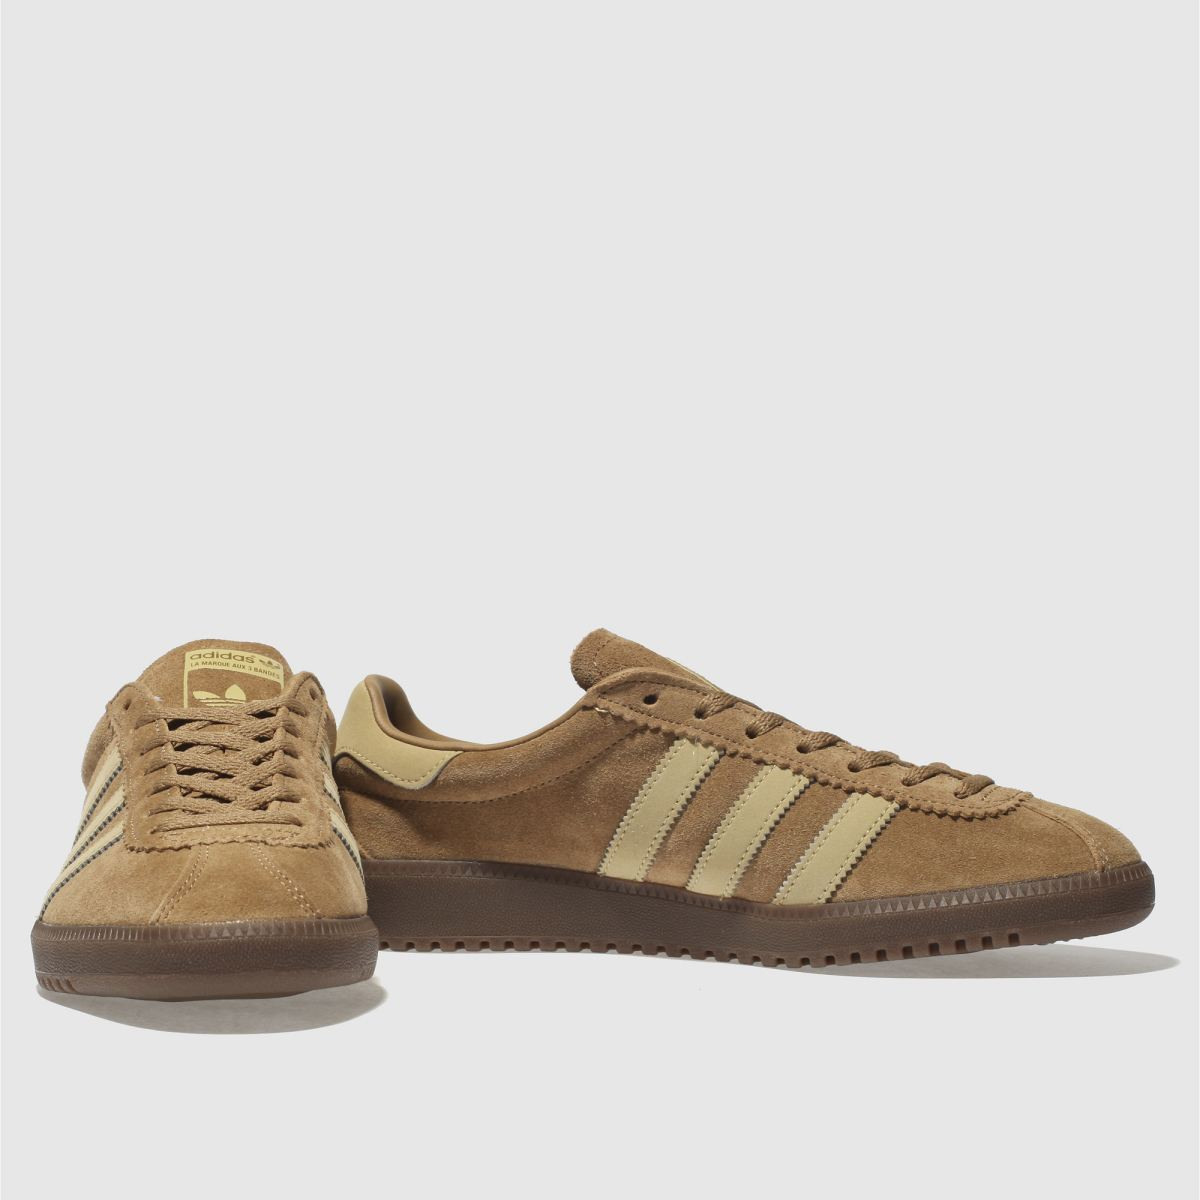 Herren Hellbraun adidas Bermuda Sneaker   schuh Gute Qualität beliebte Schuhe